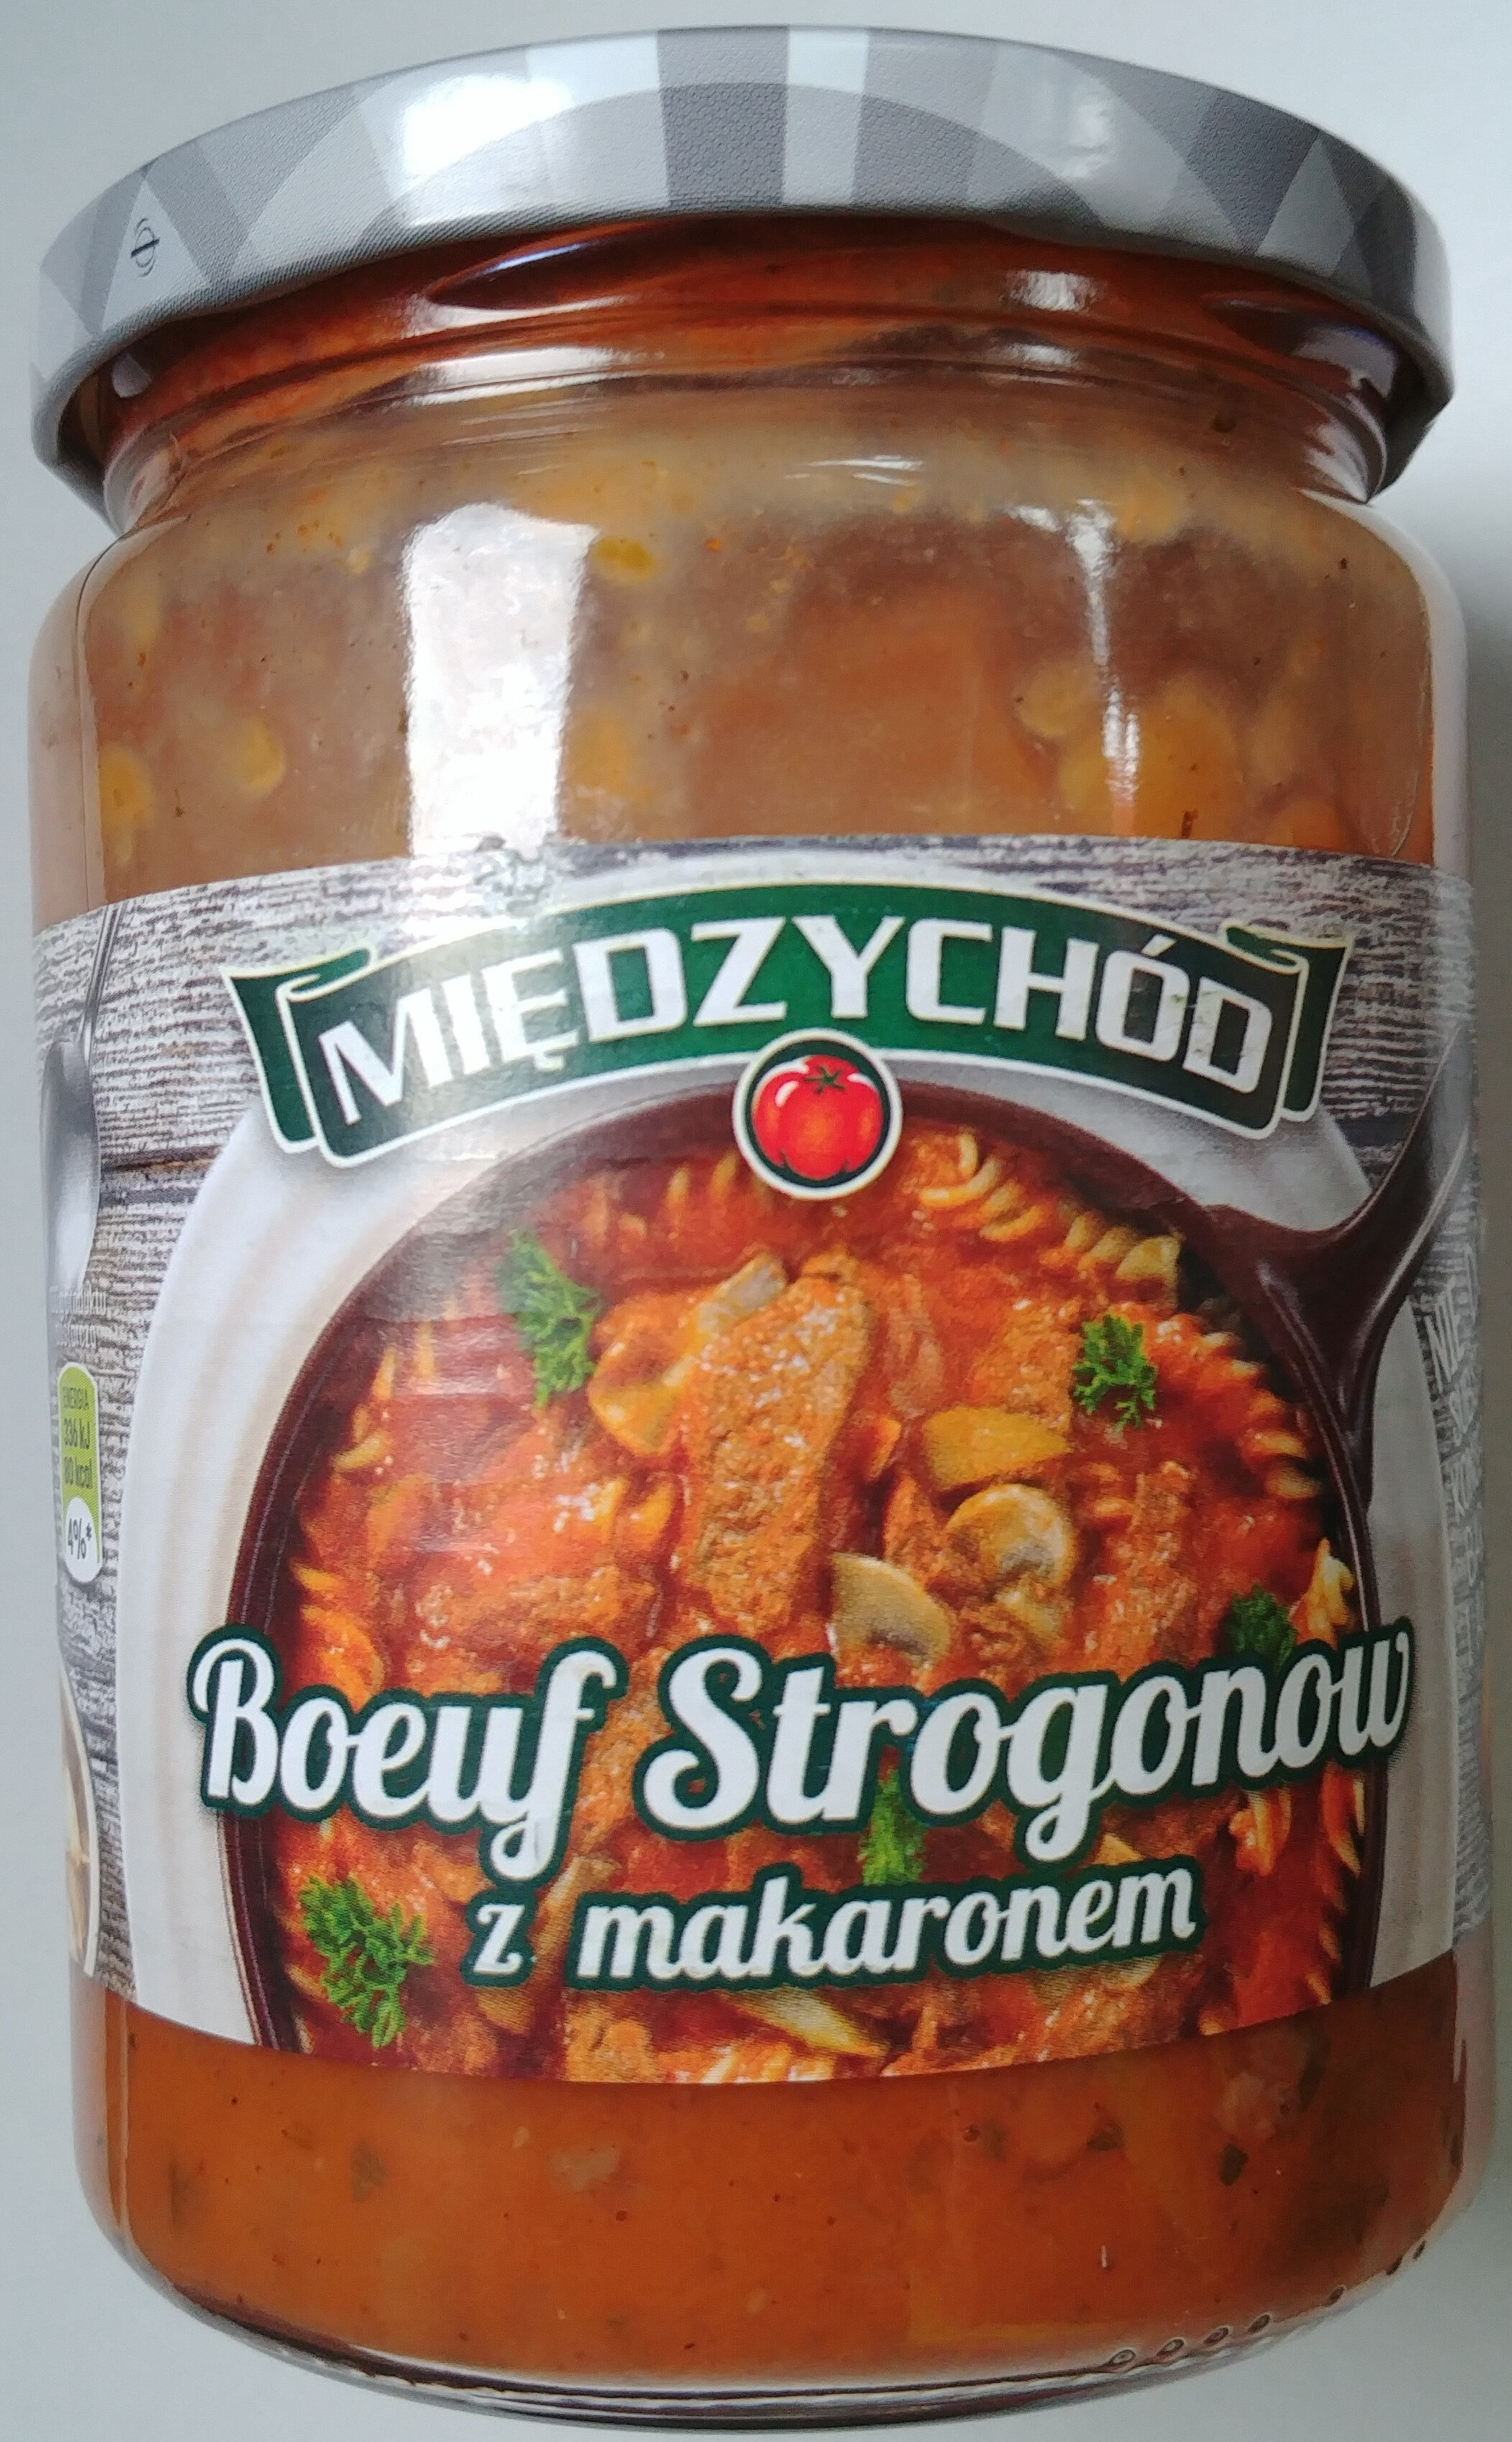 Boeuf Strogonow z makaronem - Product - pl